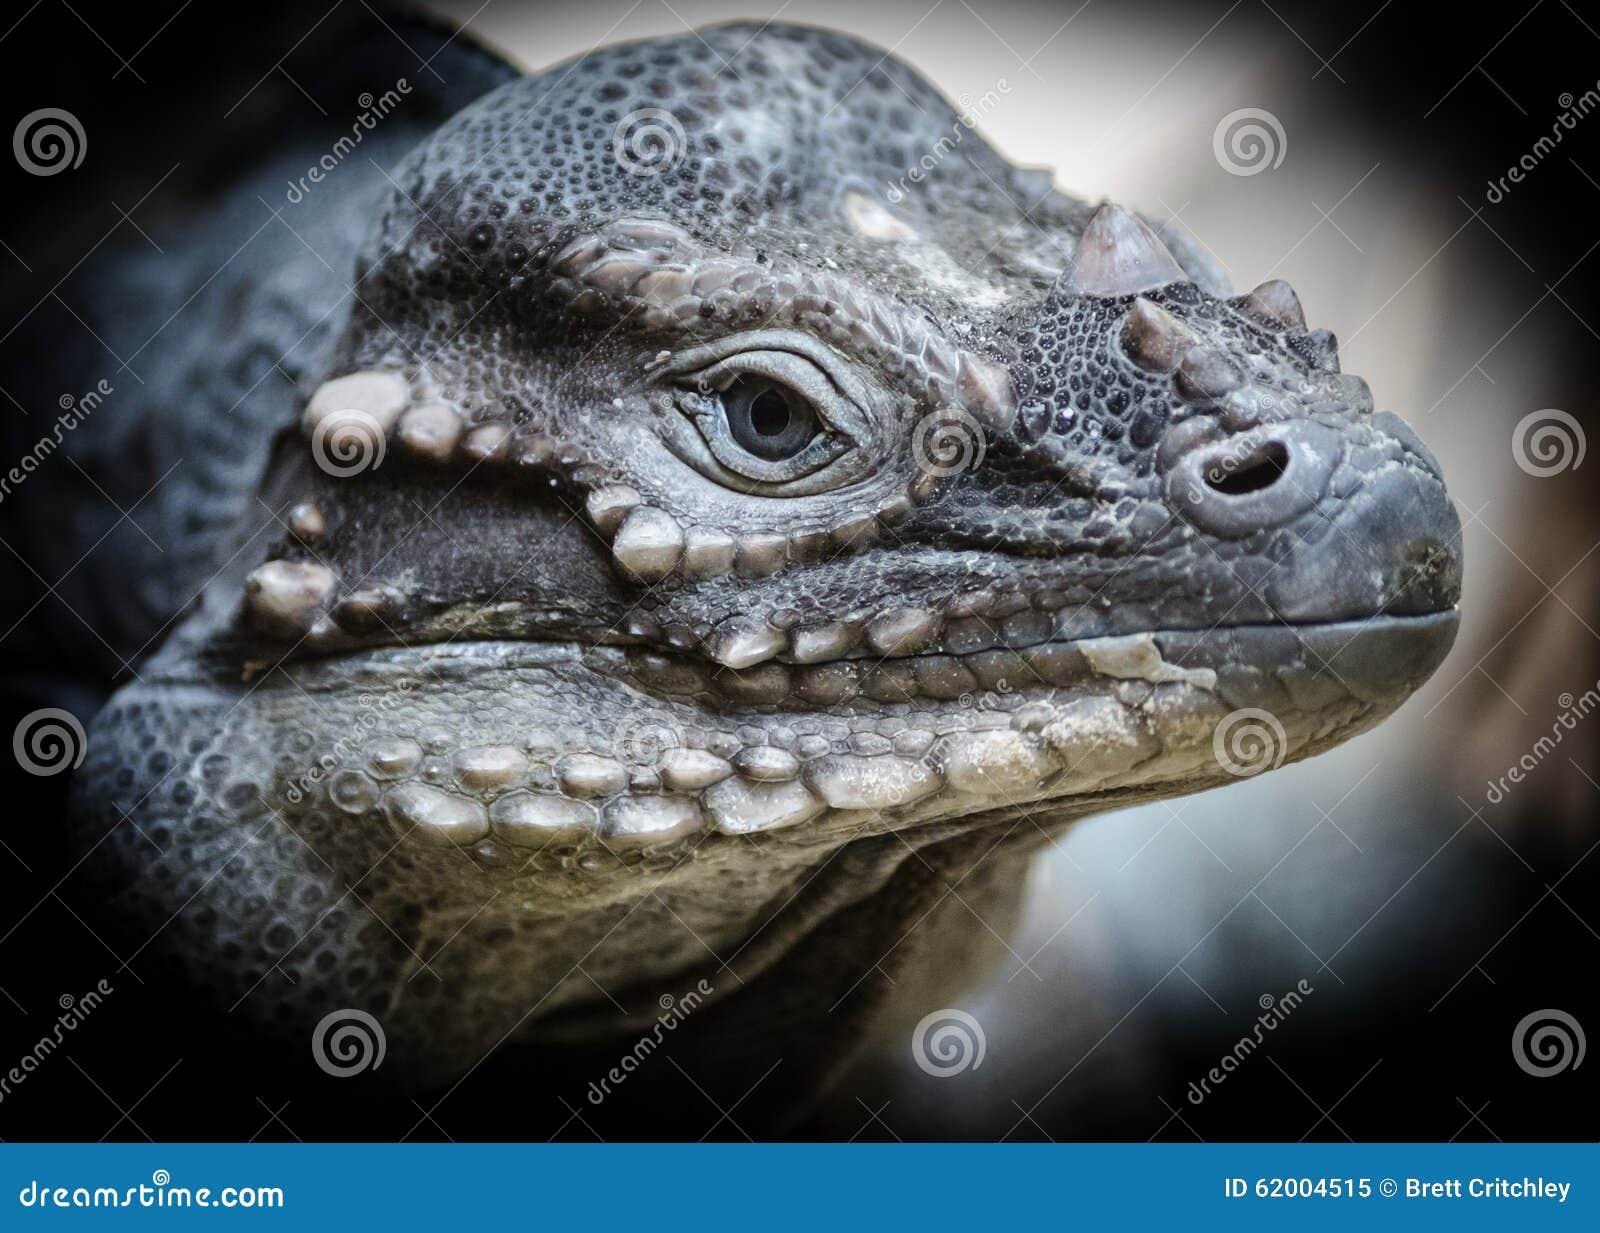 Reptile dinosaur